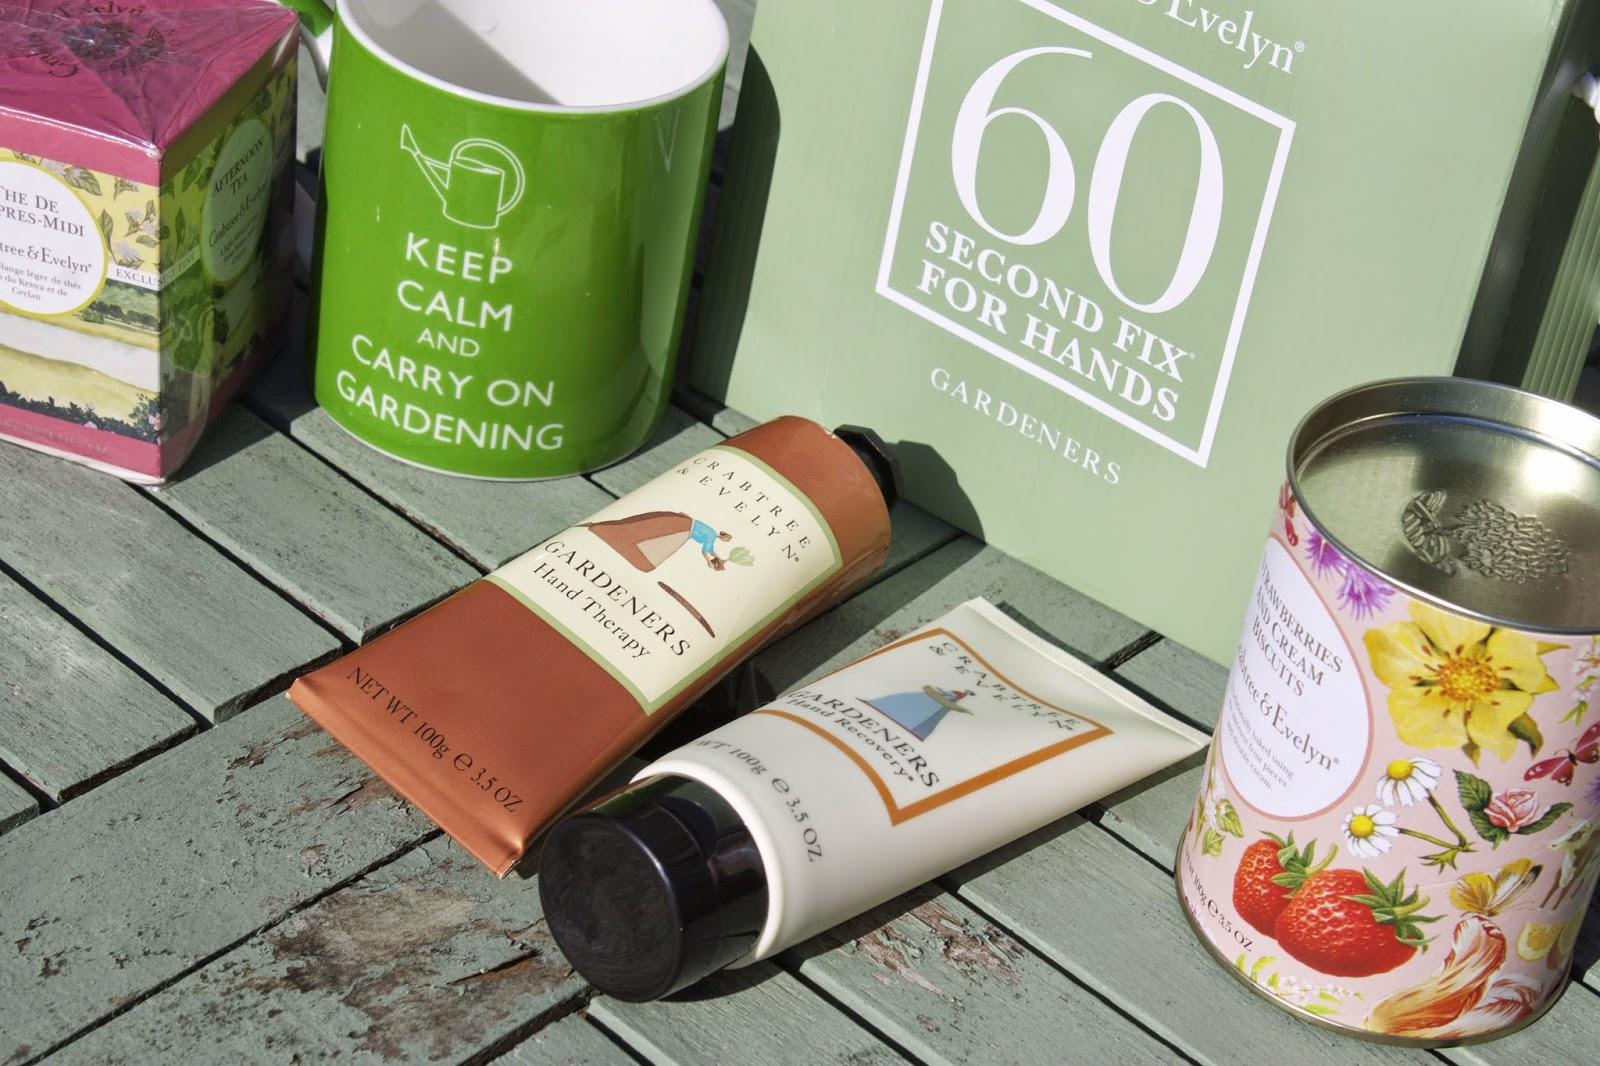 gardening, crabtree and evelyn, handcream